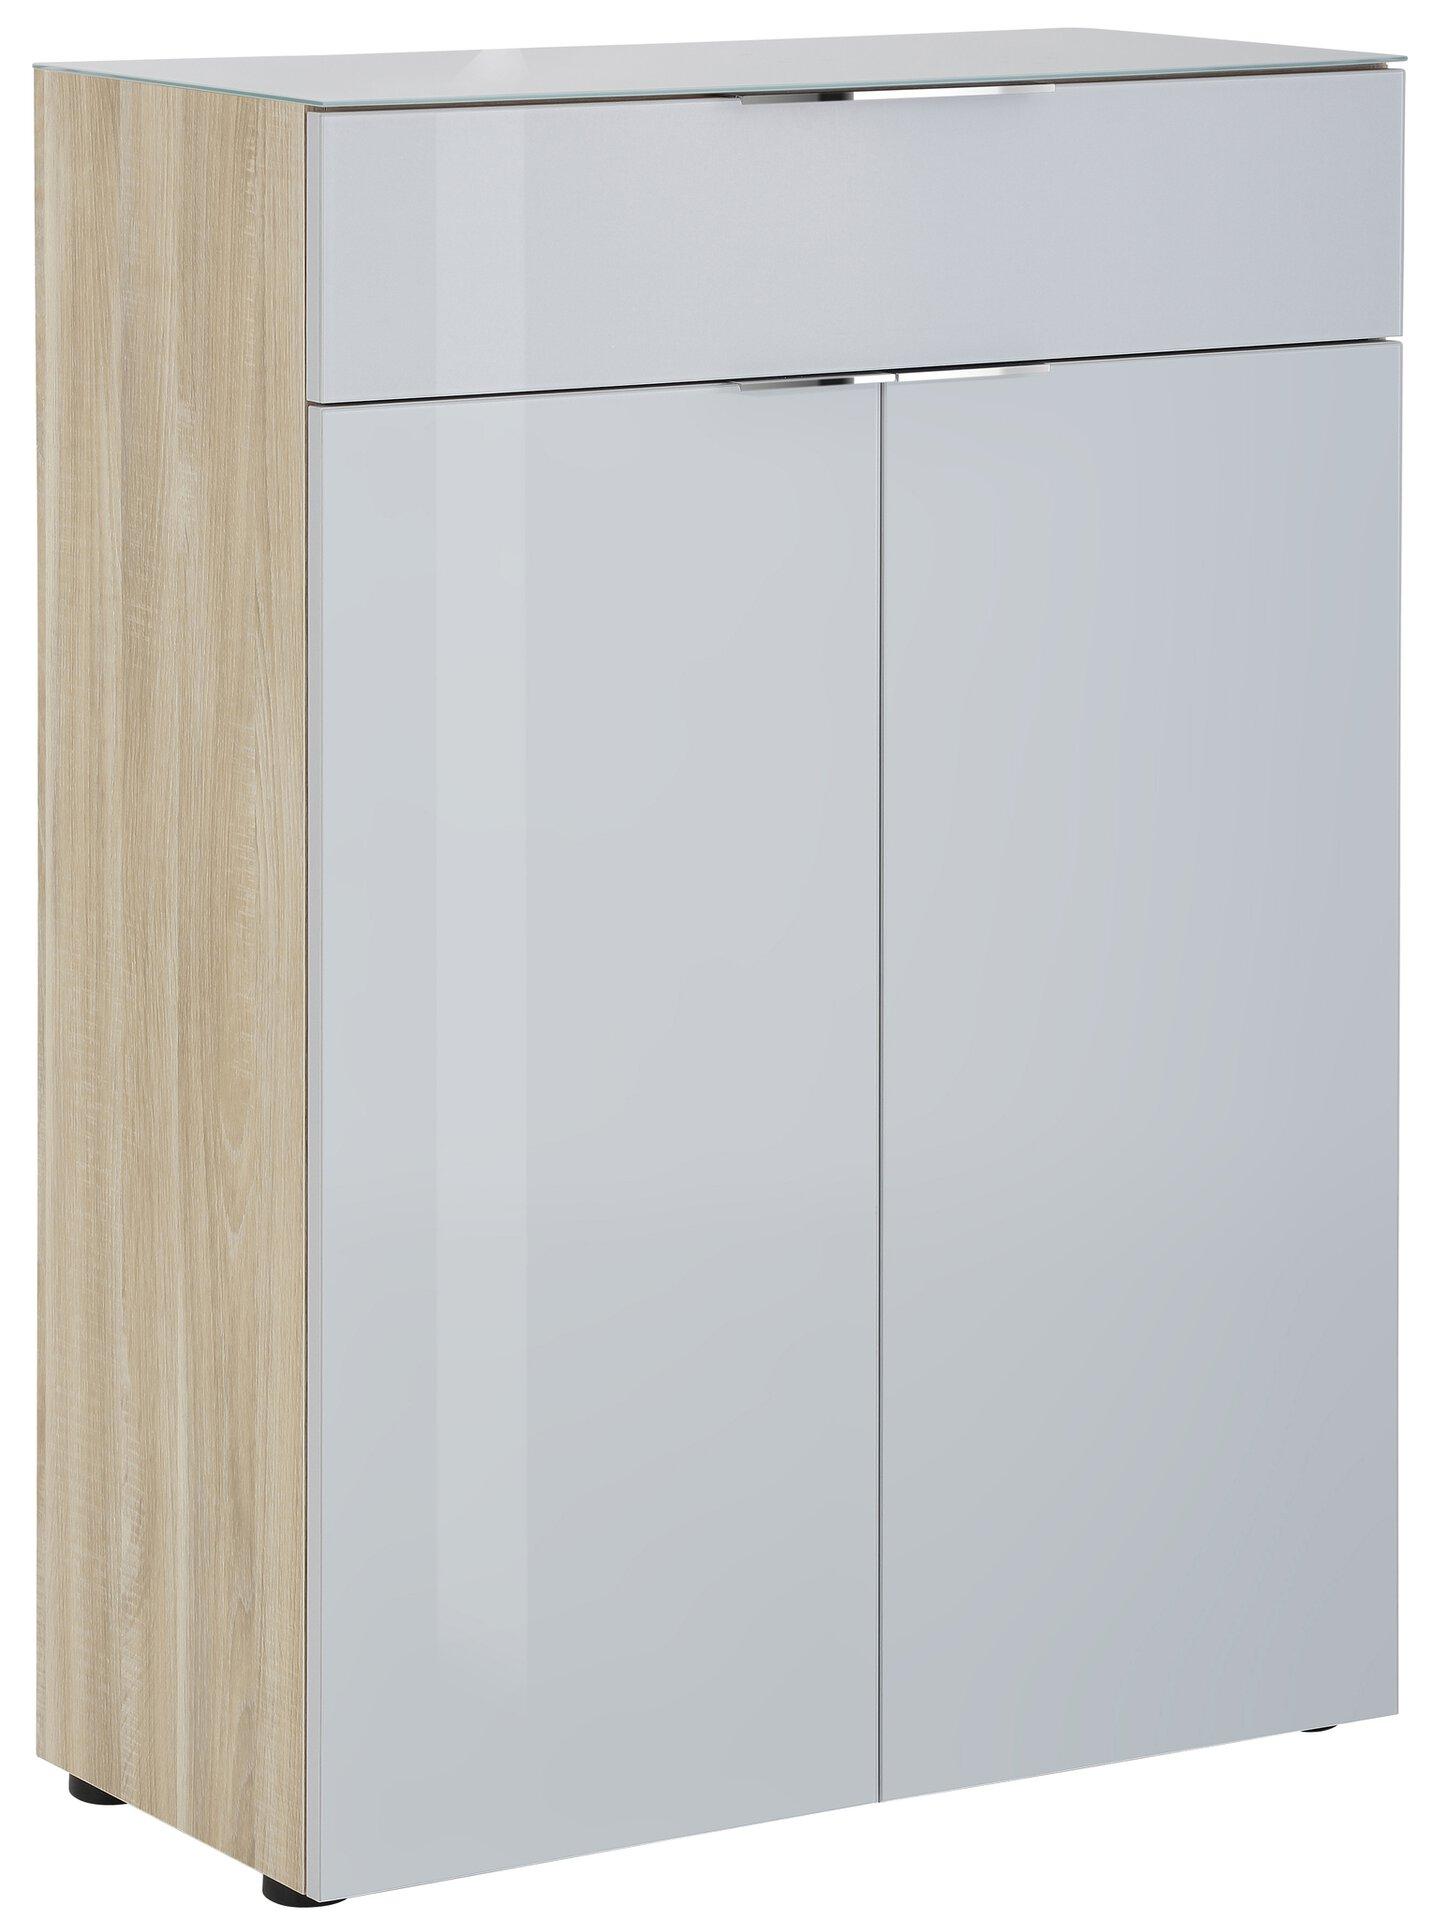 Schuhschrank SWAG Vito Holzwerkstoff braun 37 x 109 x 79 cm